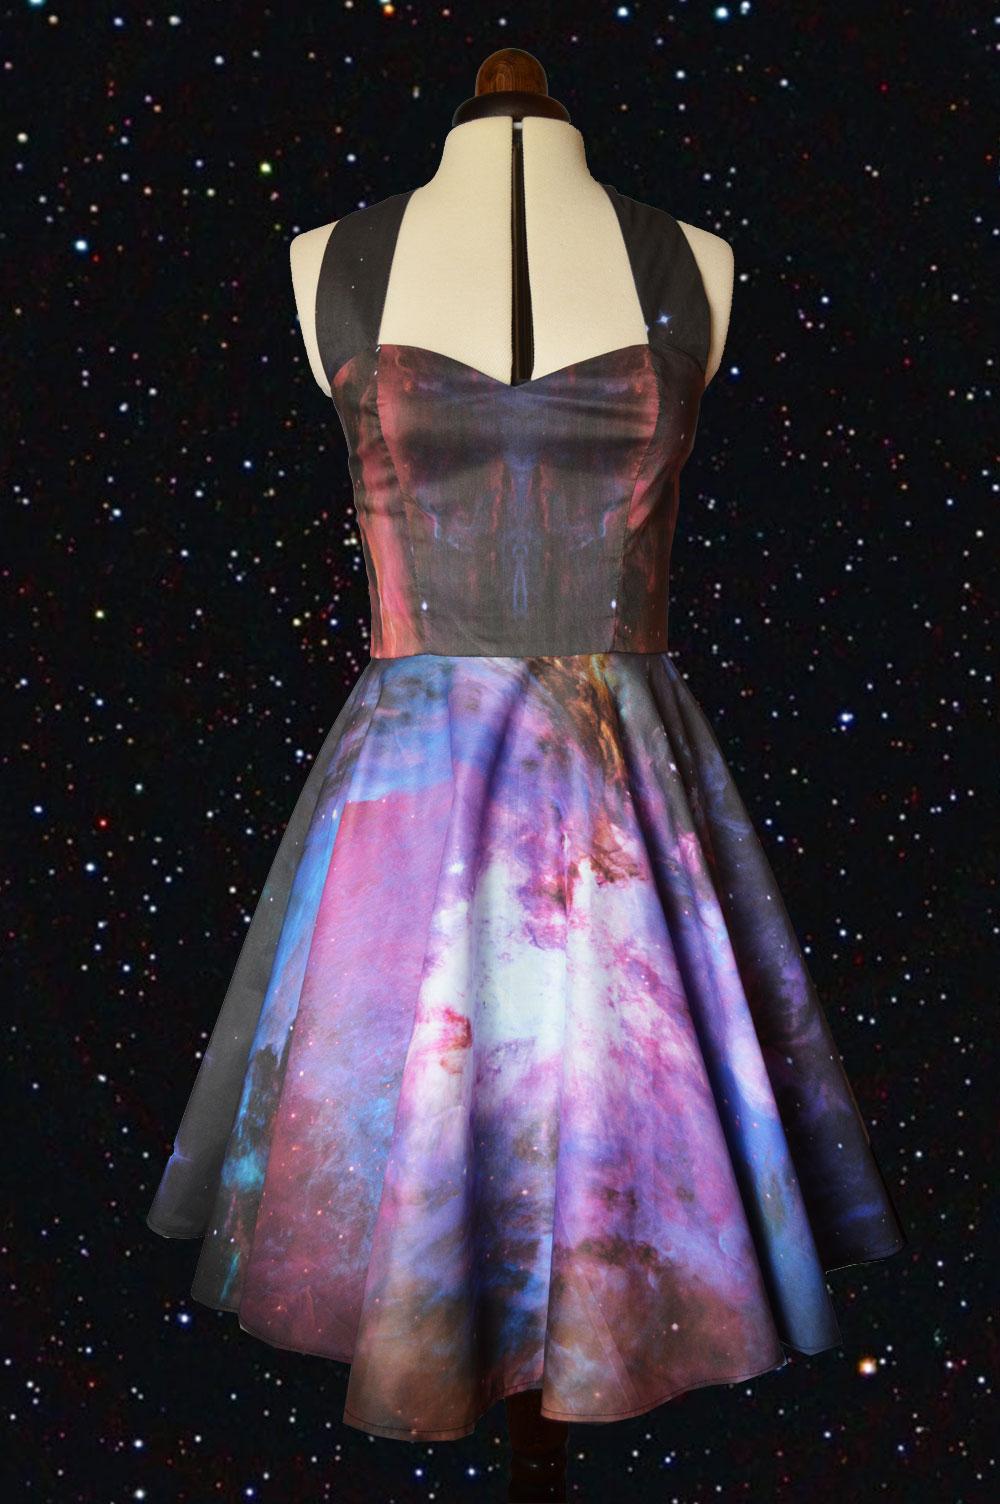 Cyanide Kiss Galaxy dress